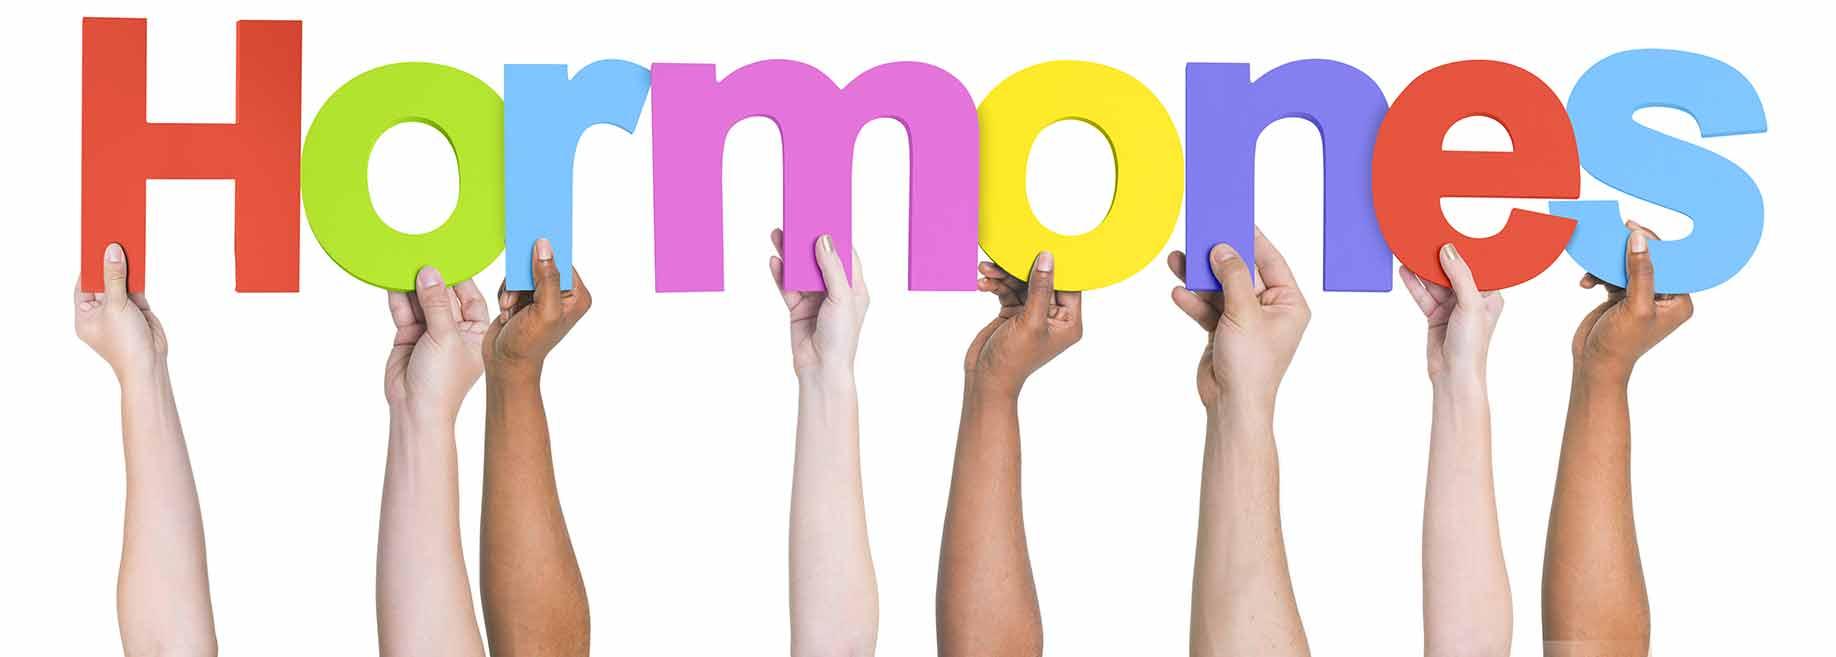 hormones imbalance menopause menses periods pms natural remedies balance